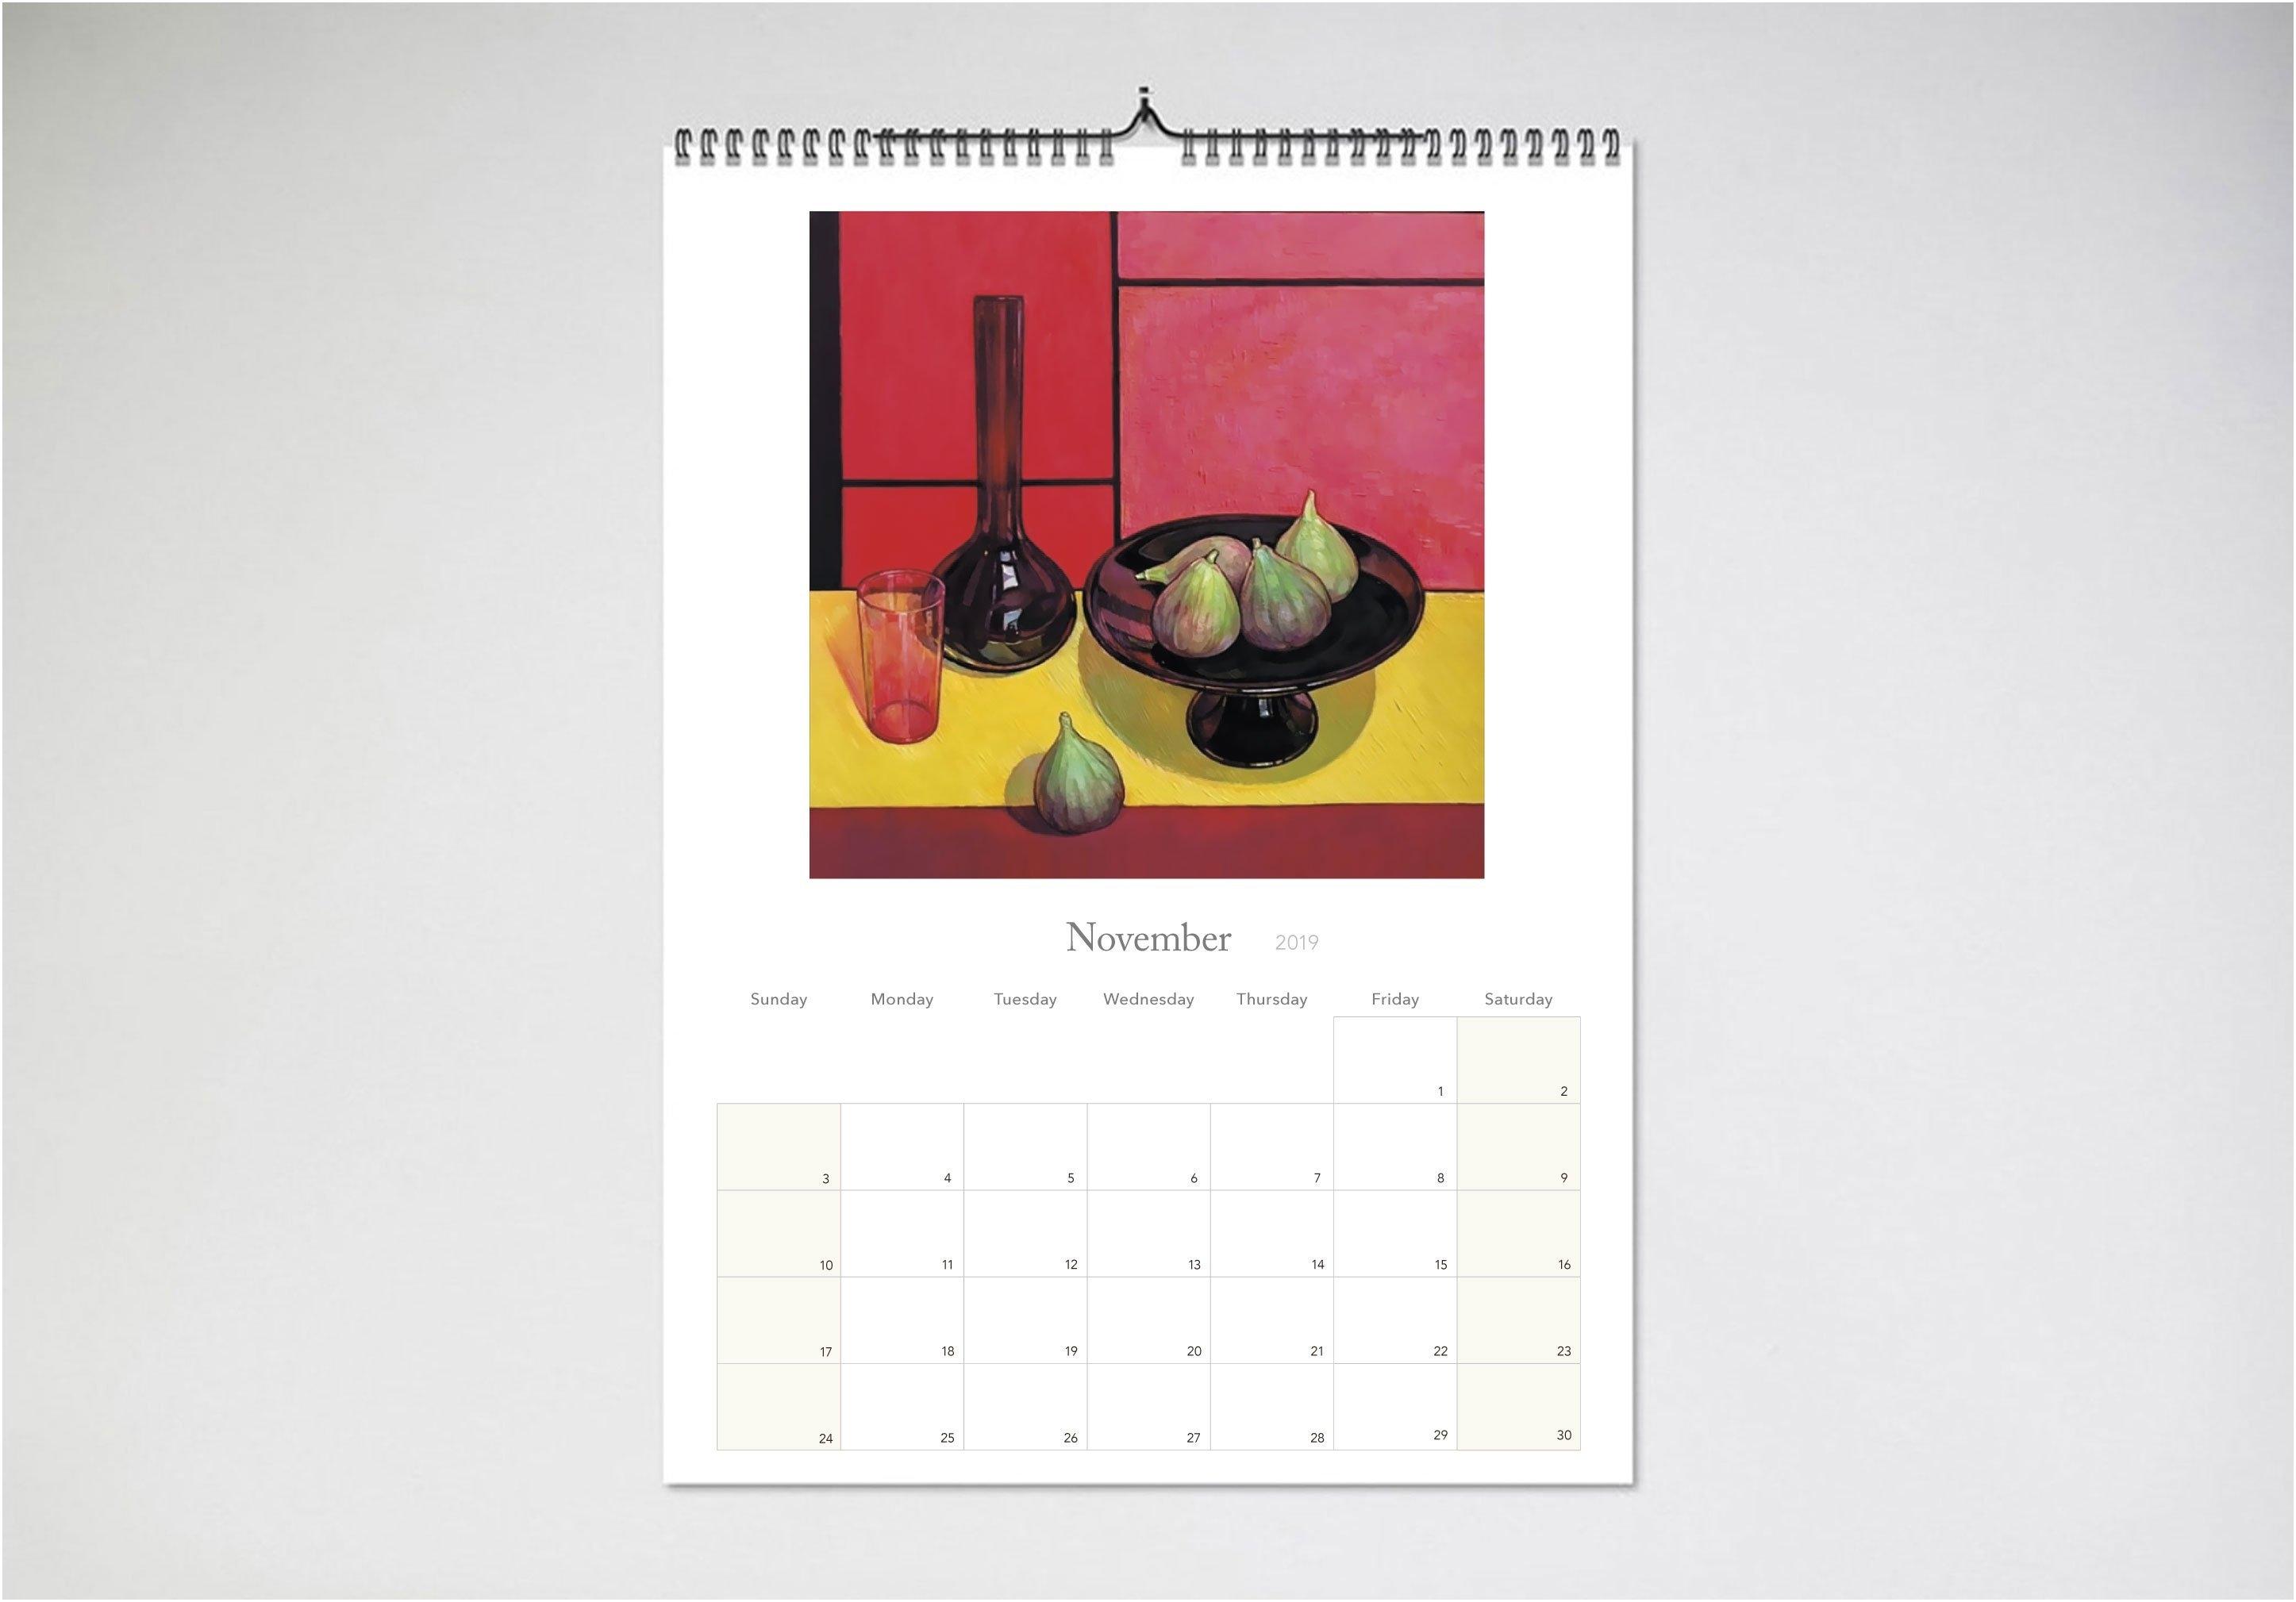 Cheap Wall Calendars 2019 To Download Or Print   Americanwomanmag Calendar 2019 Cheap